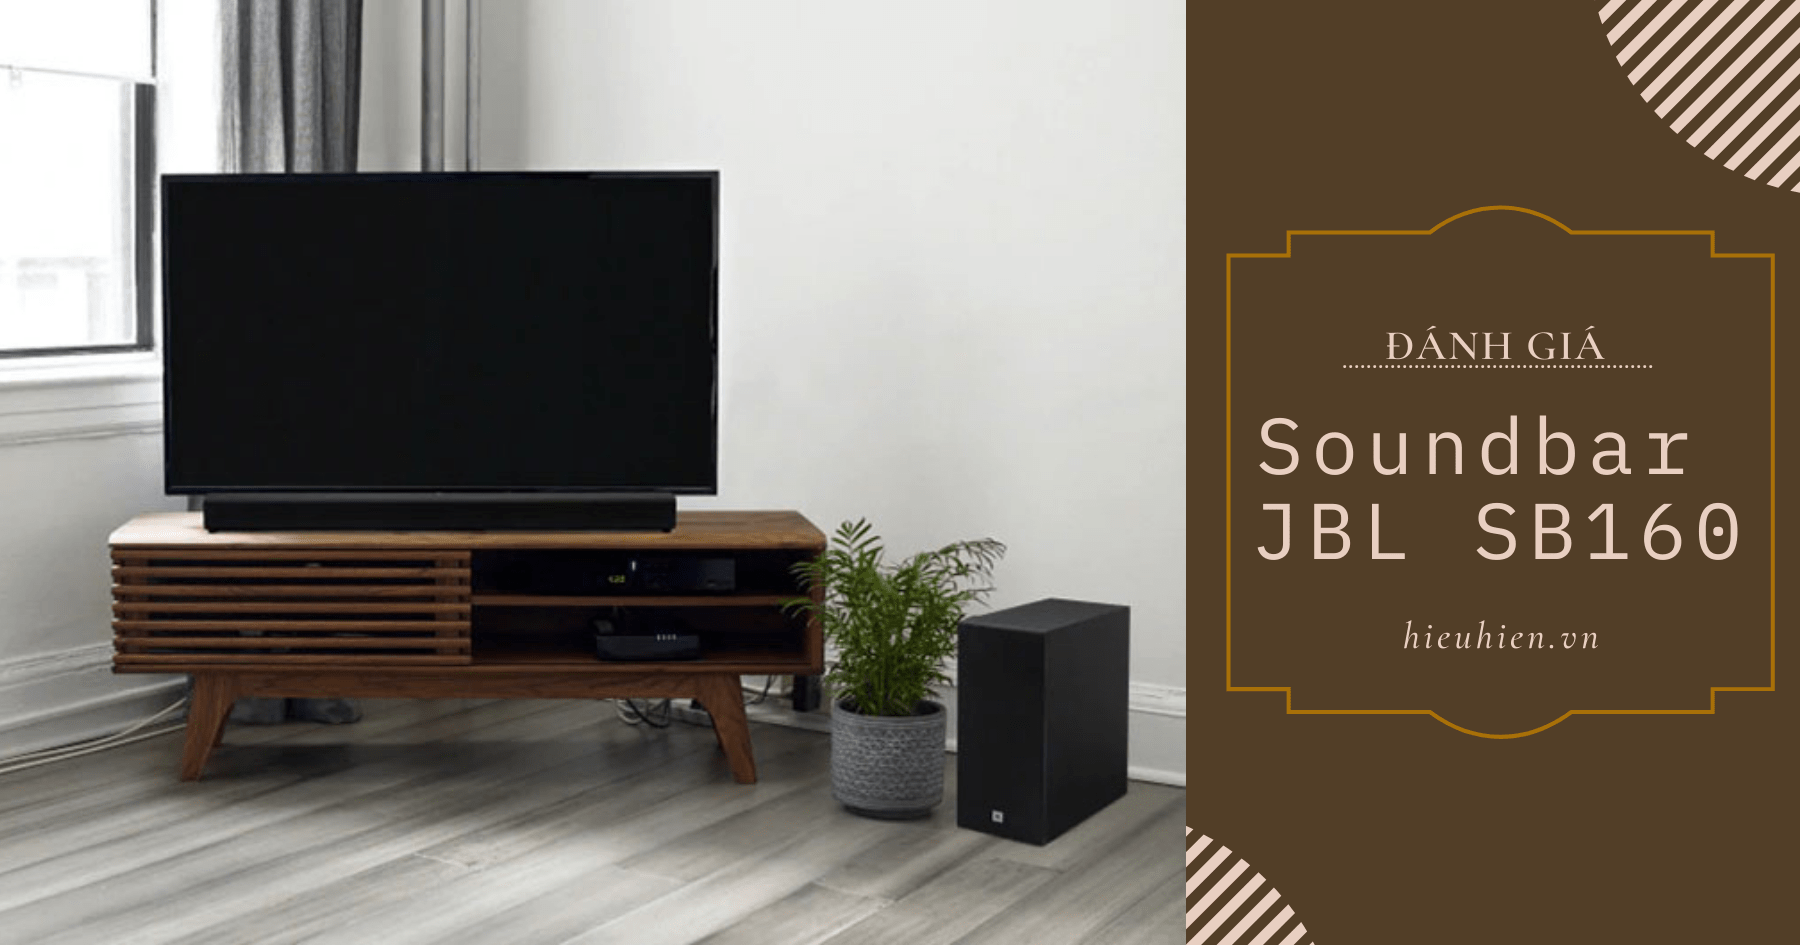 đánh giá sound bar jbl sb160